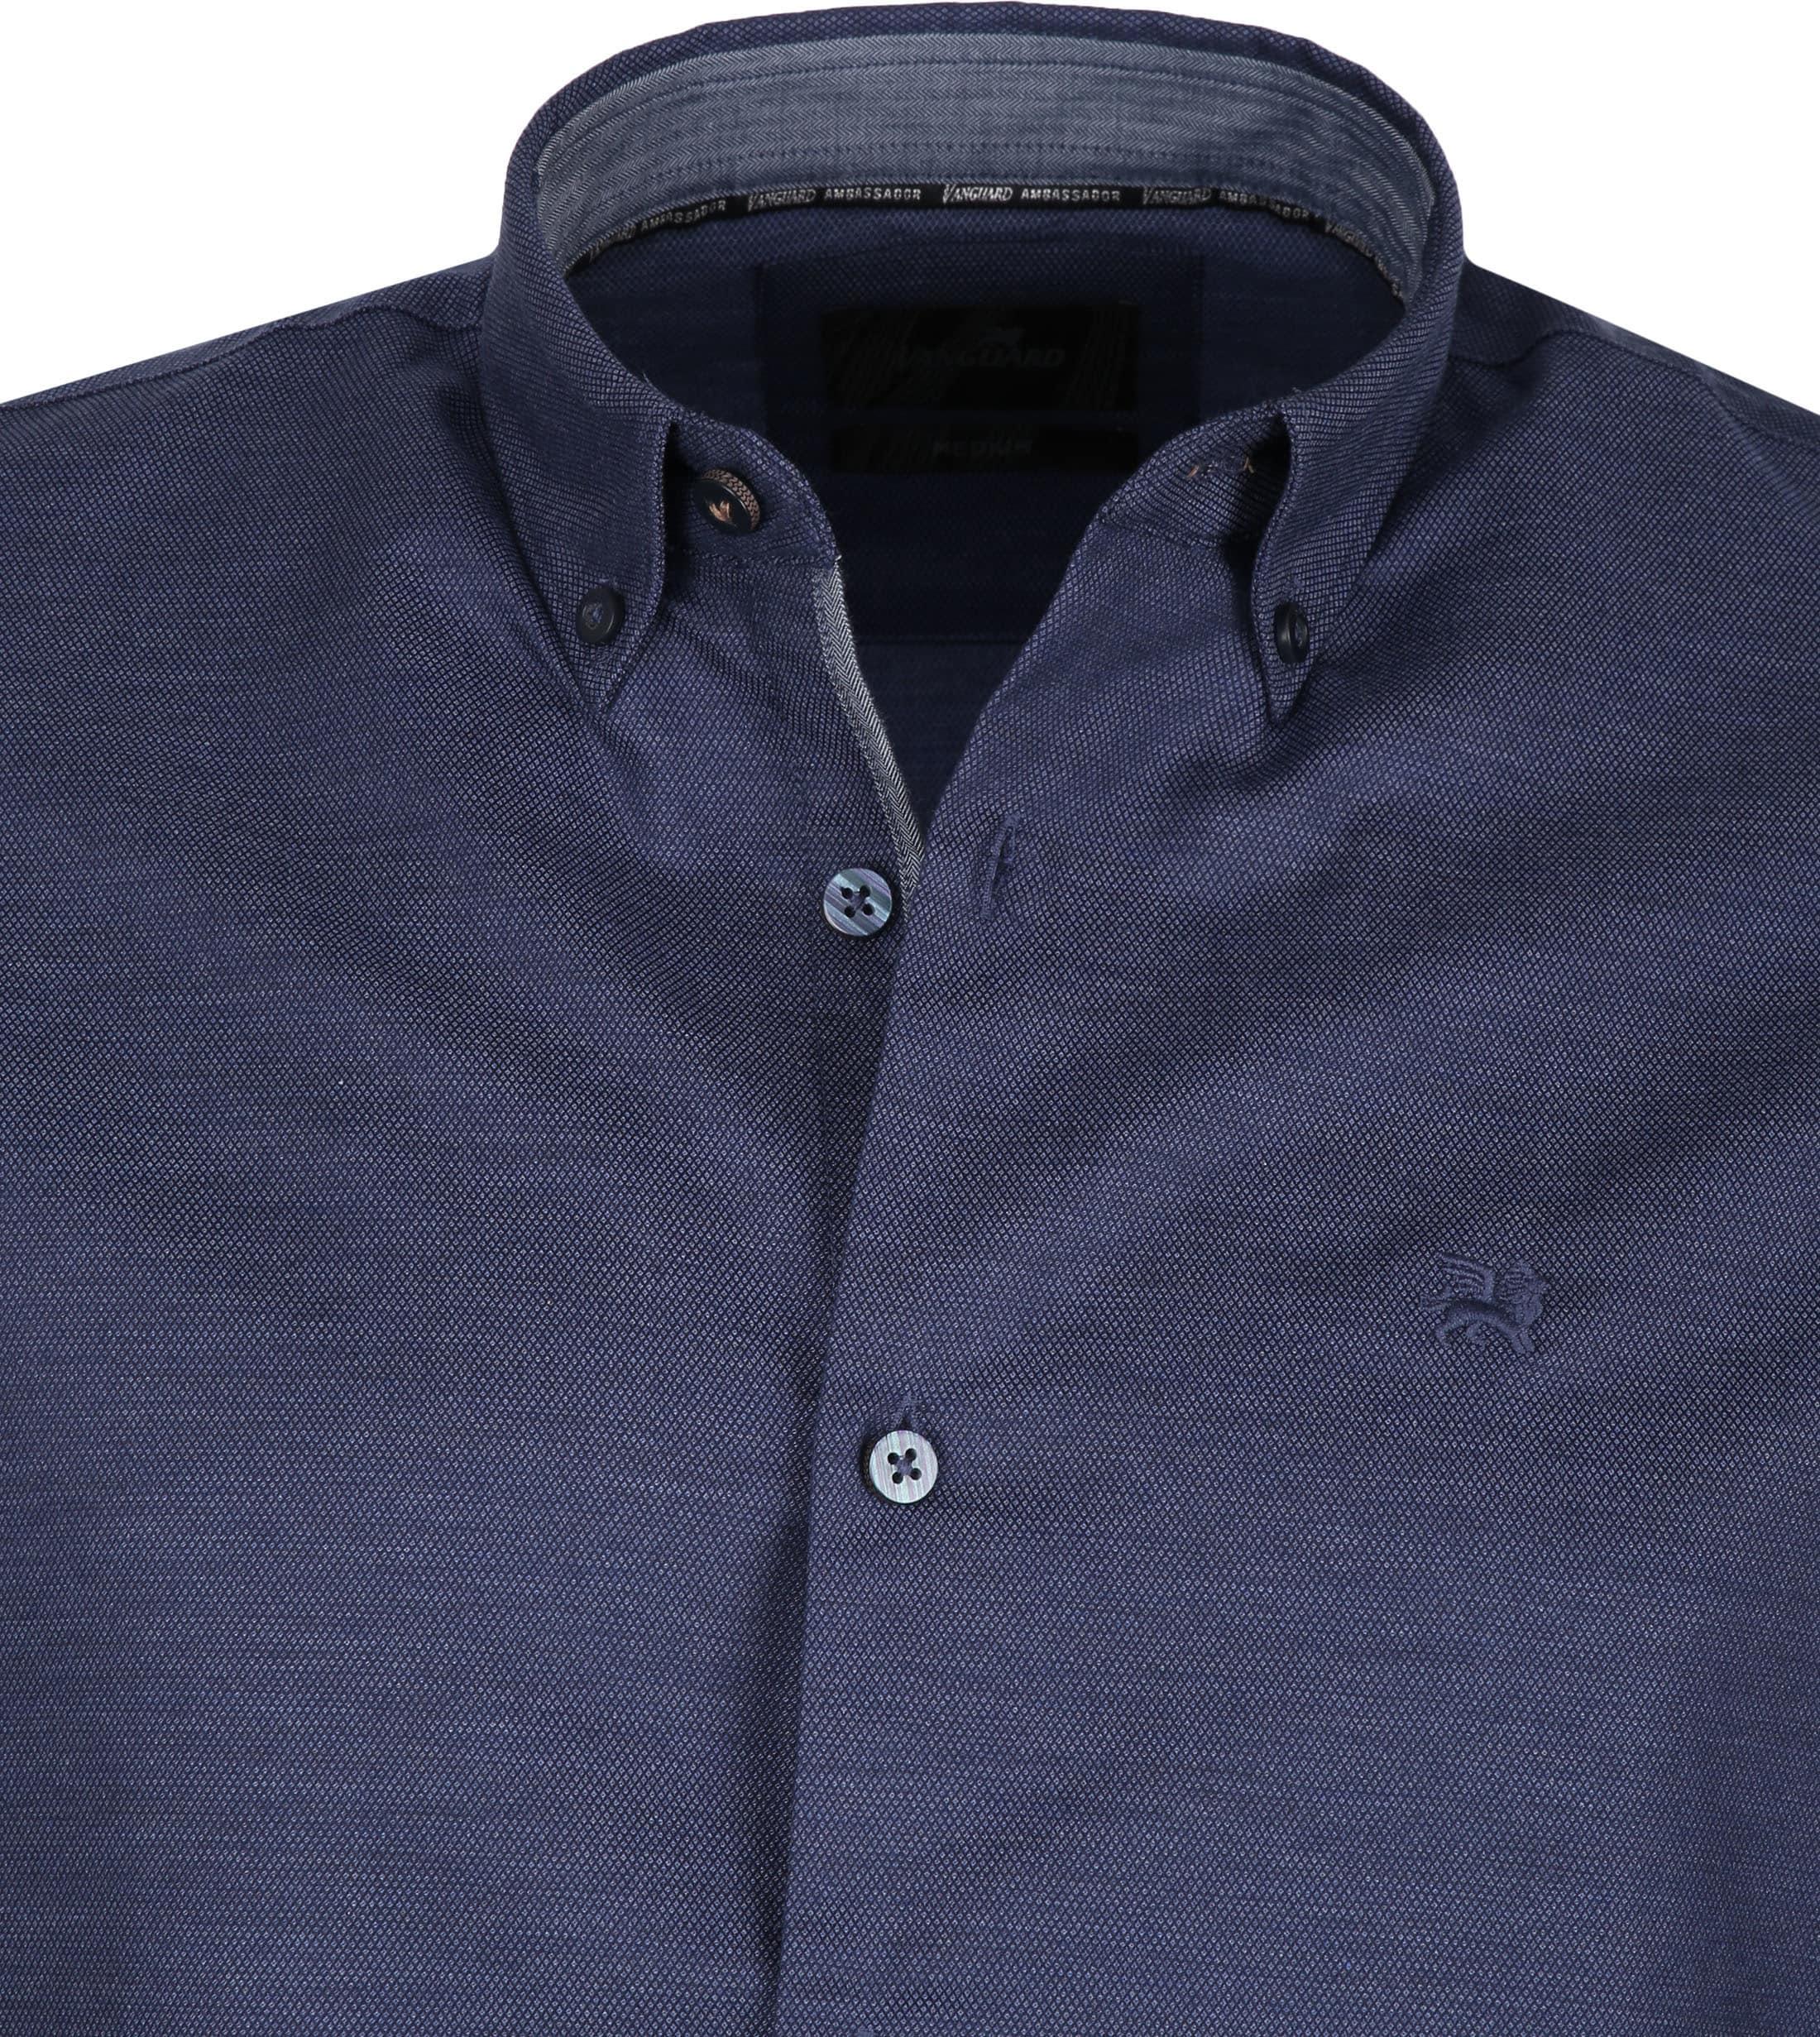 Vanguard Solid Shirt Navy foto 1